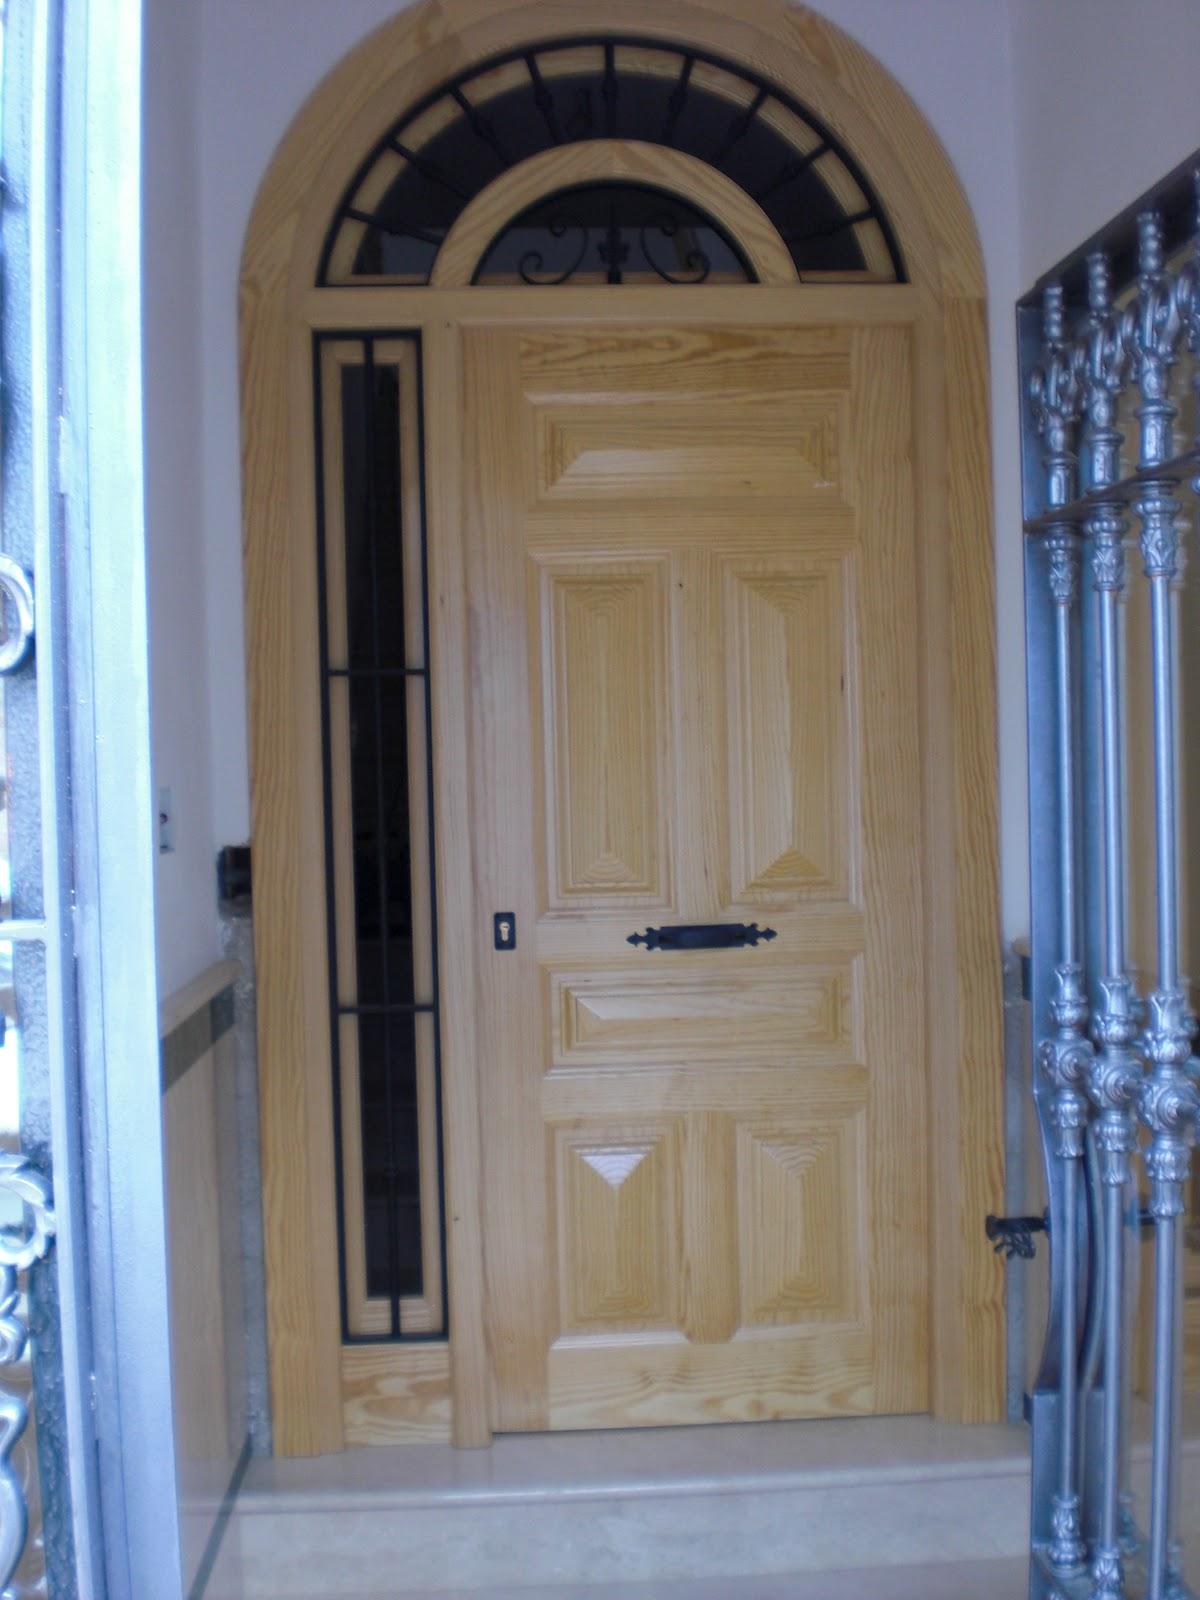 Carpinteria vela puertas de entrada - Puertas de entrada madera ...